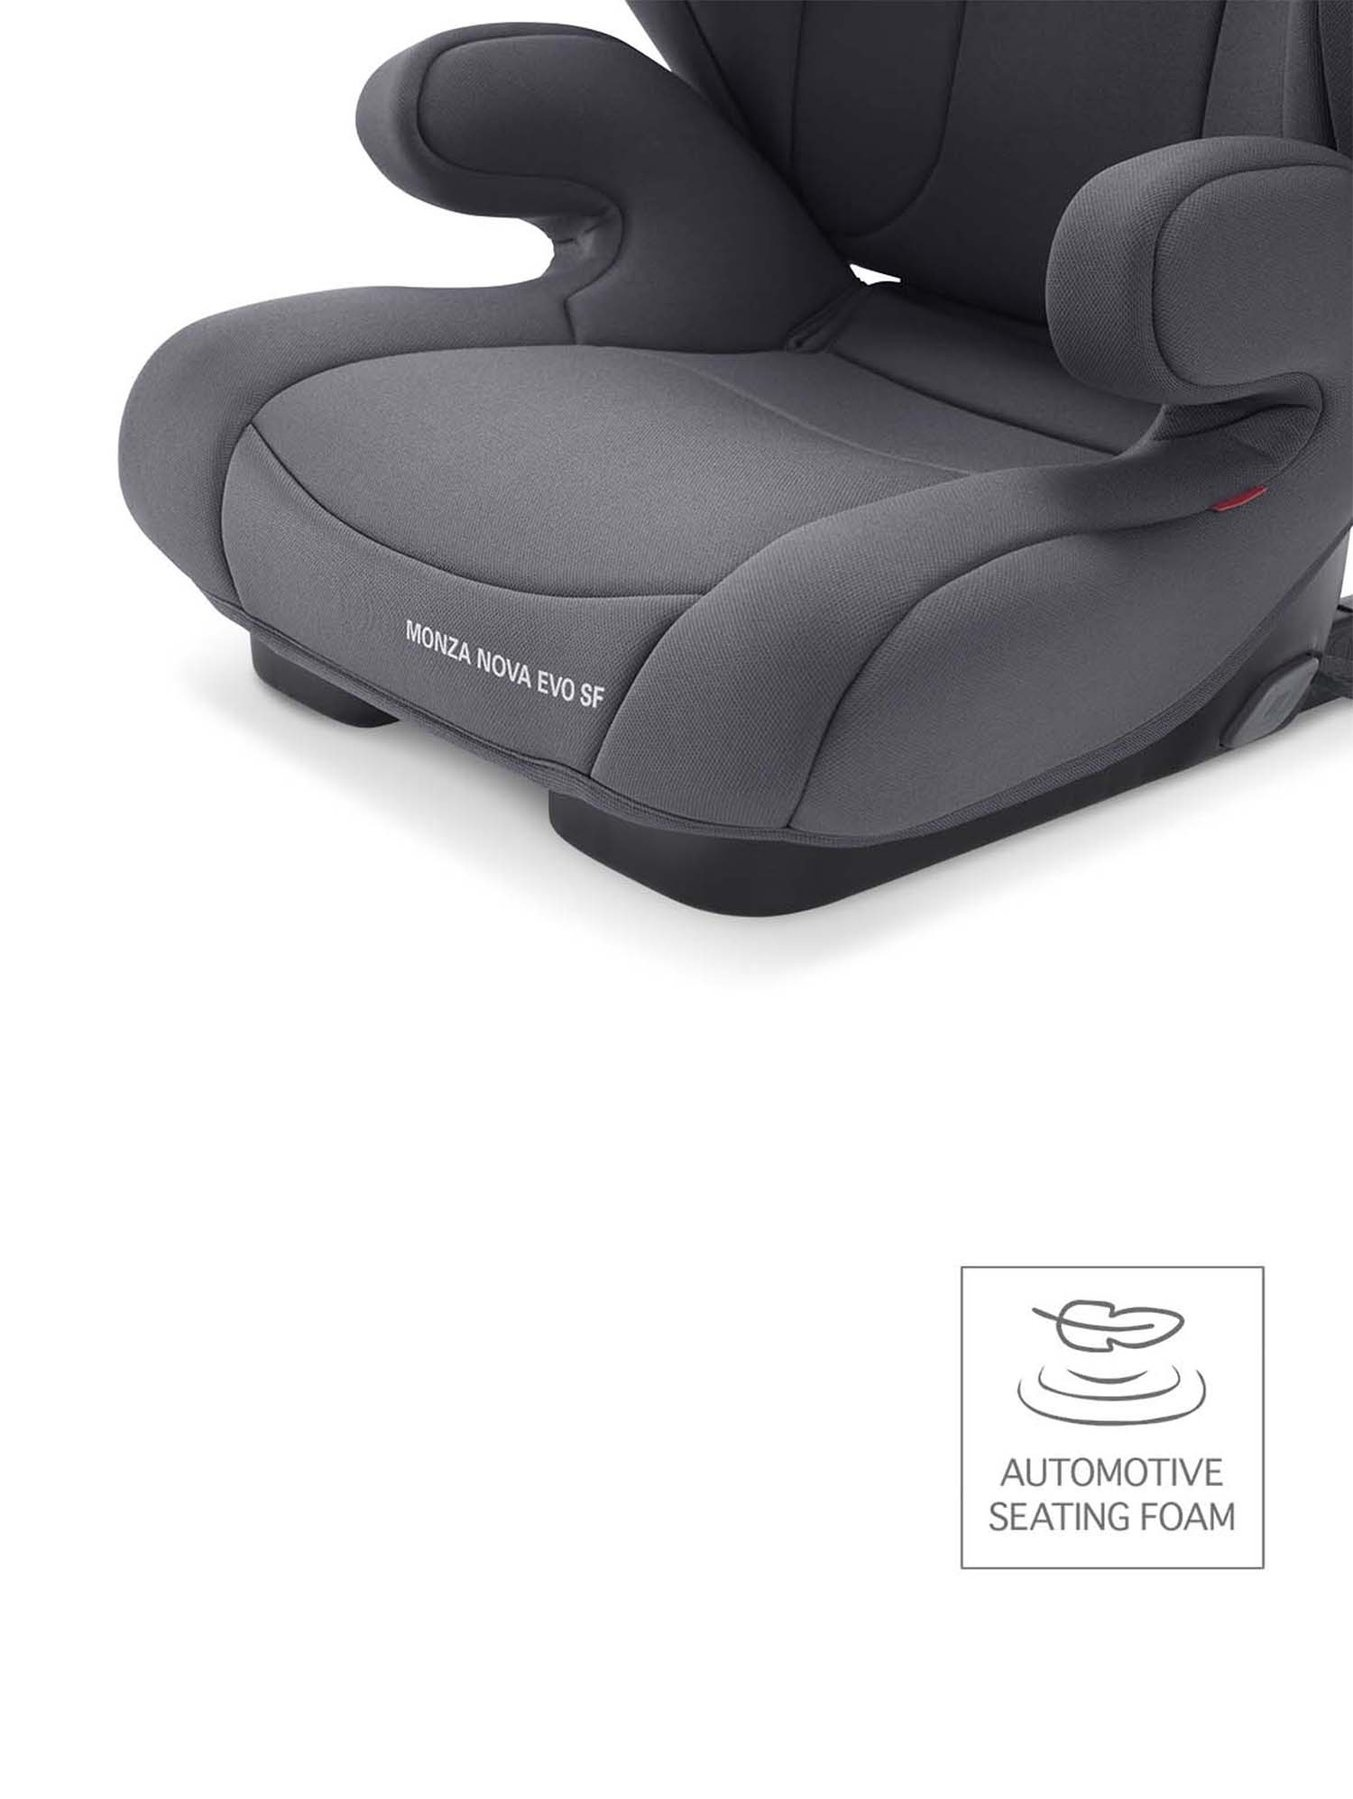 Recaro Recaro Monza Nova EVO Seatfix Core Deep Black